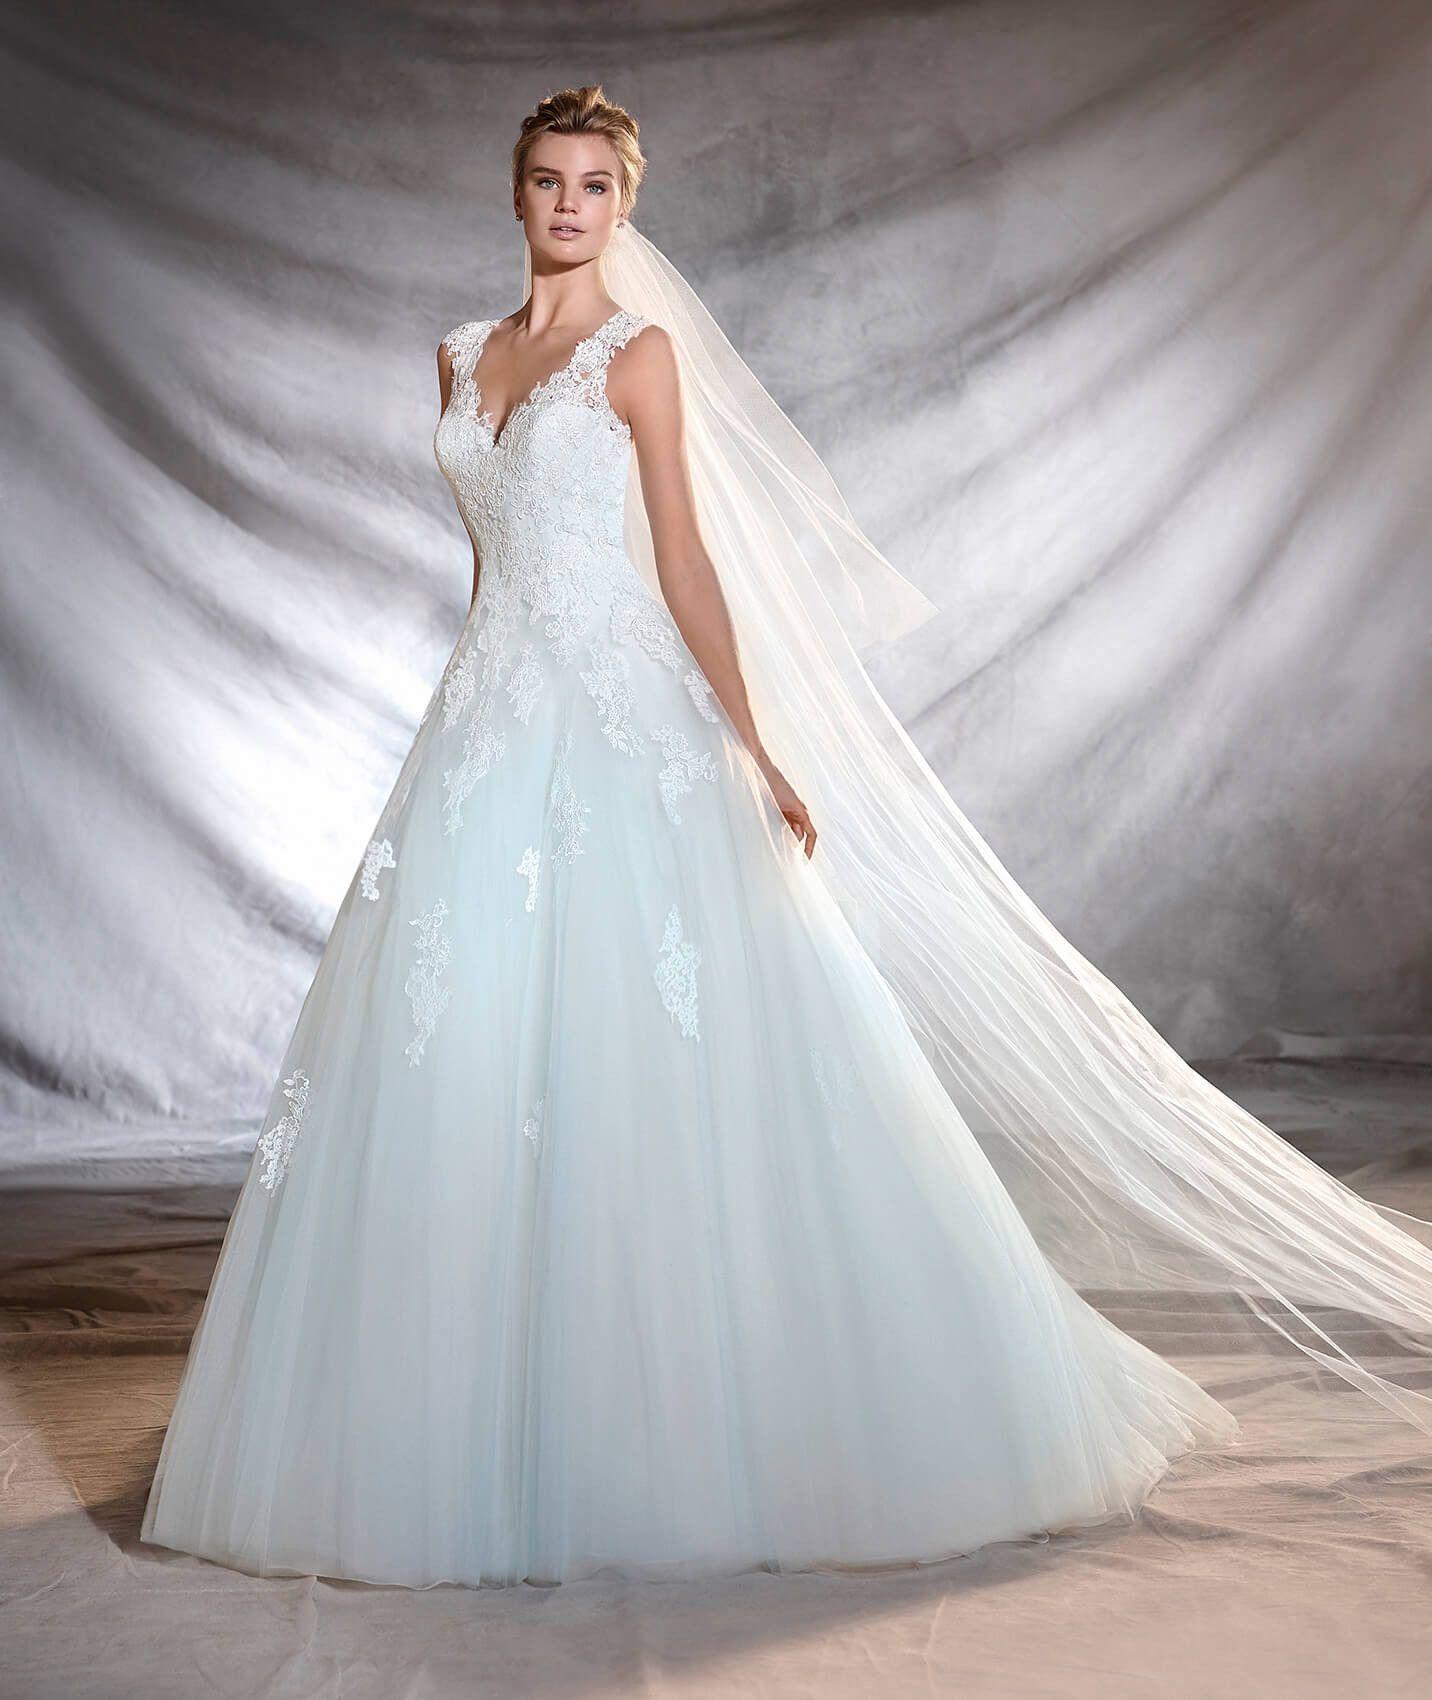 Großartig Vestidos Novia Cortos Pronovias Zeitgenössisch - Hochzeit ...